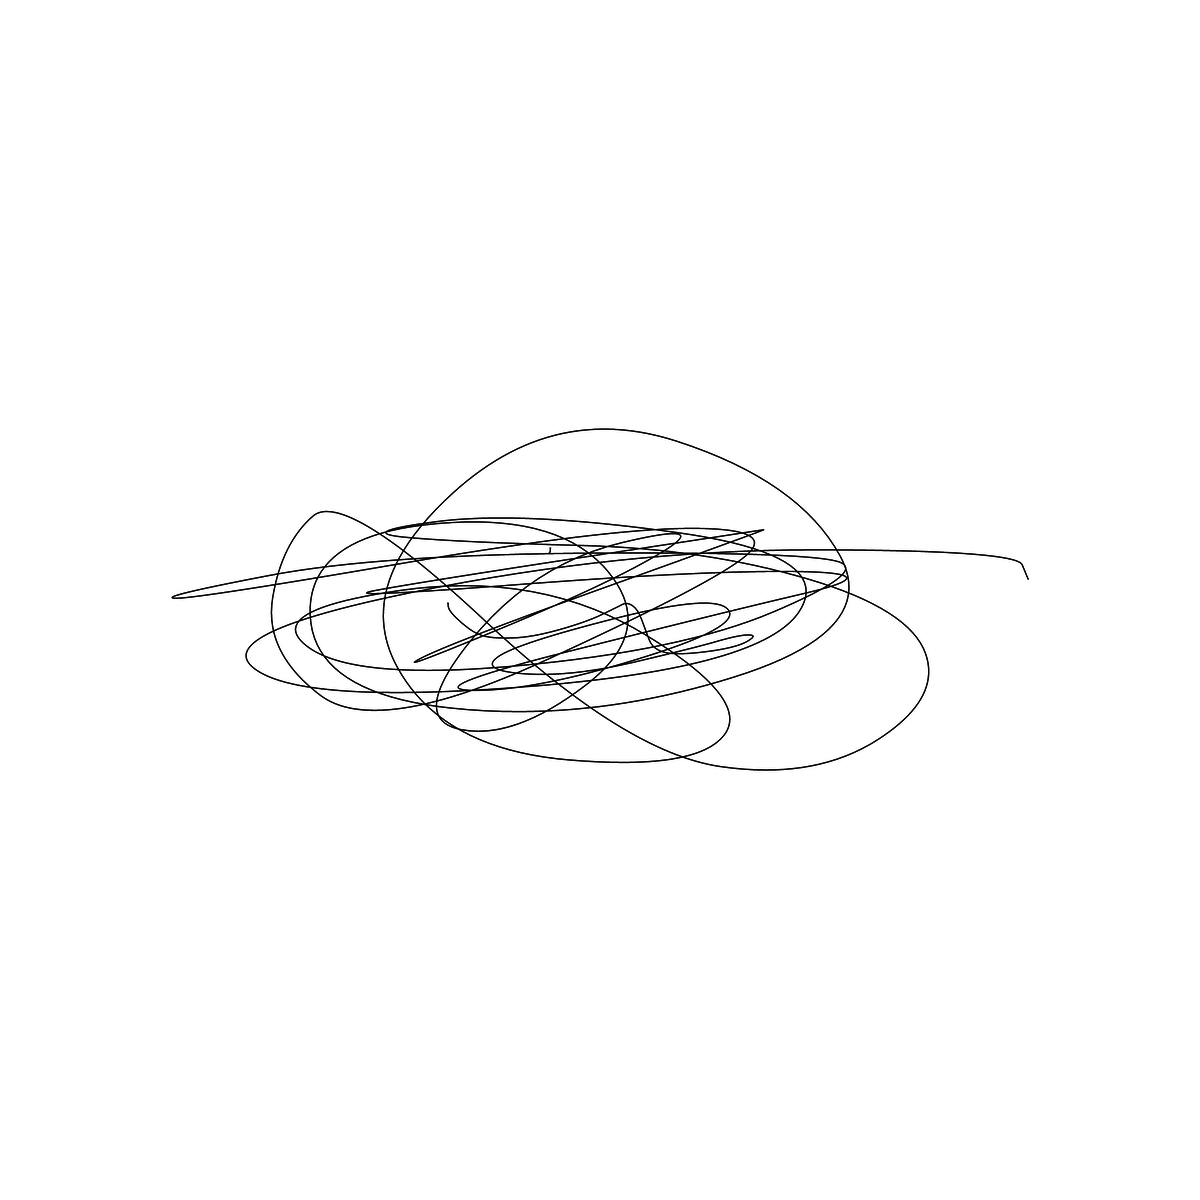 BAAAM drawing#1734 lat:51.5355529785156250lng: -0.1327206492424011